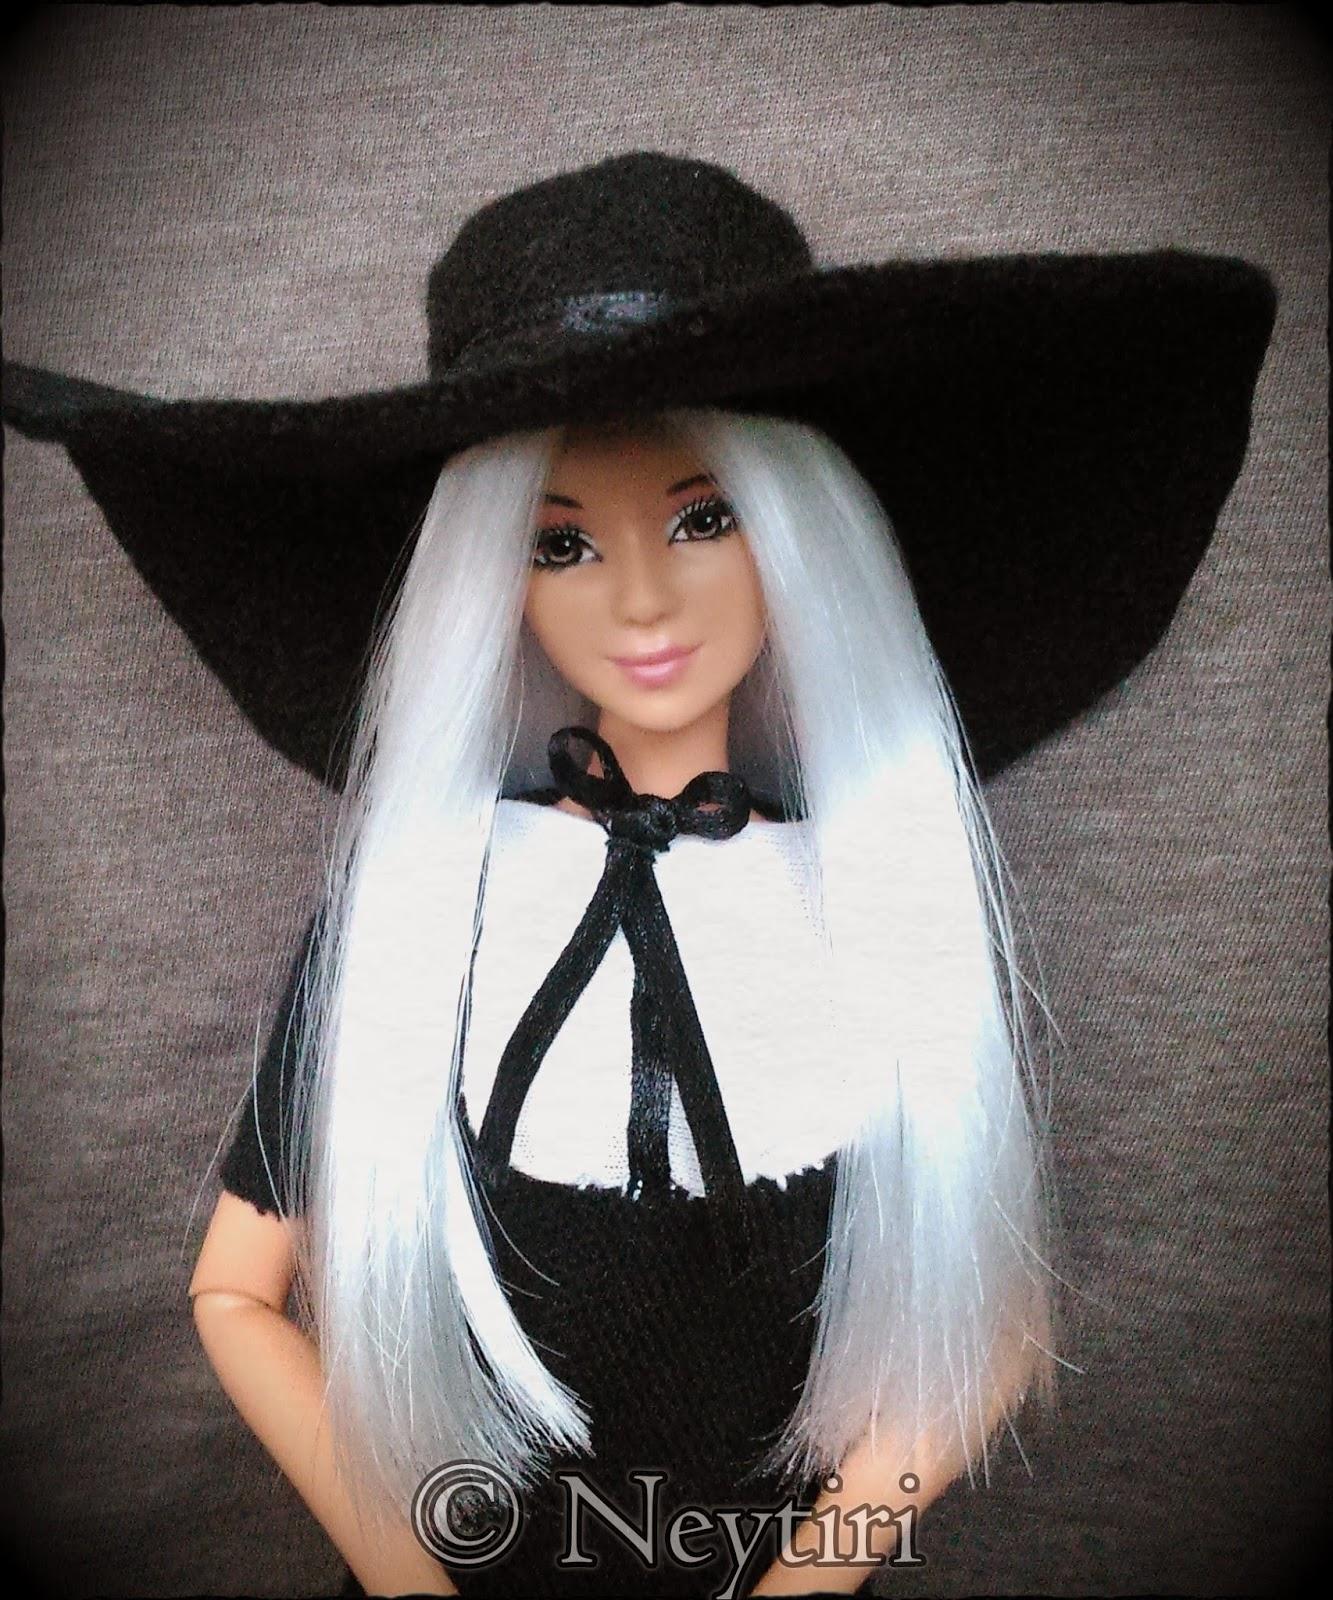 2ne1 Barbie doll Dara Missing You